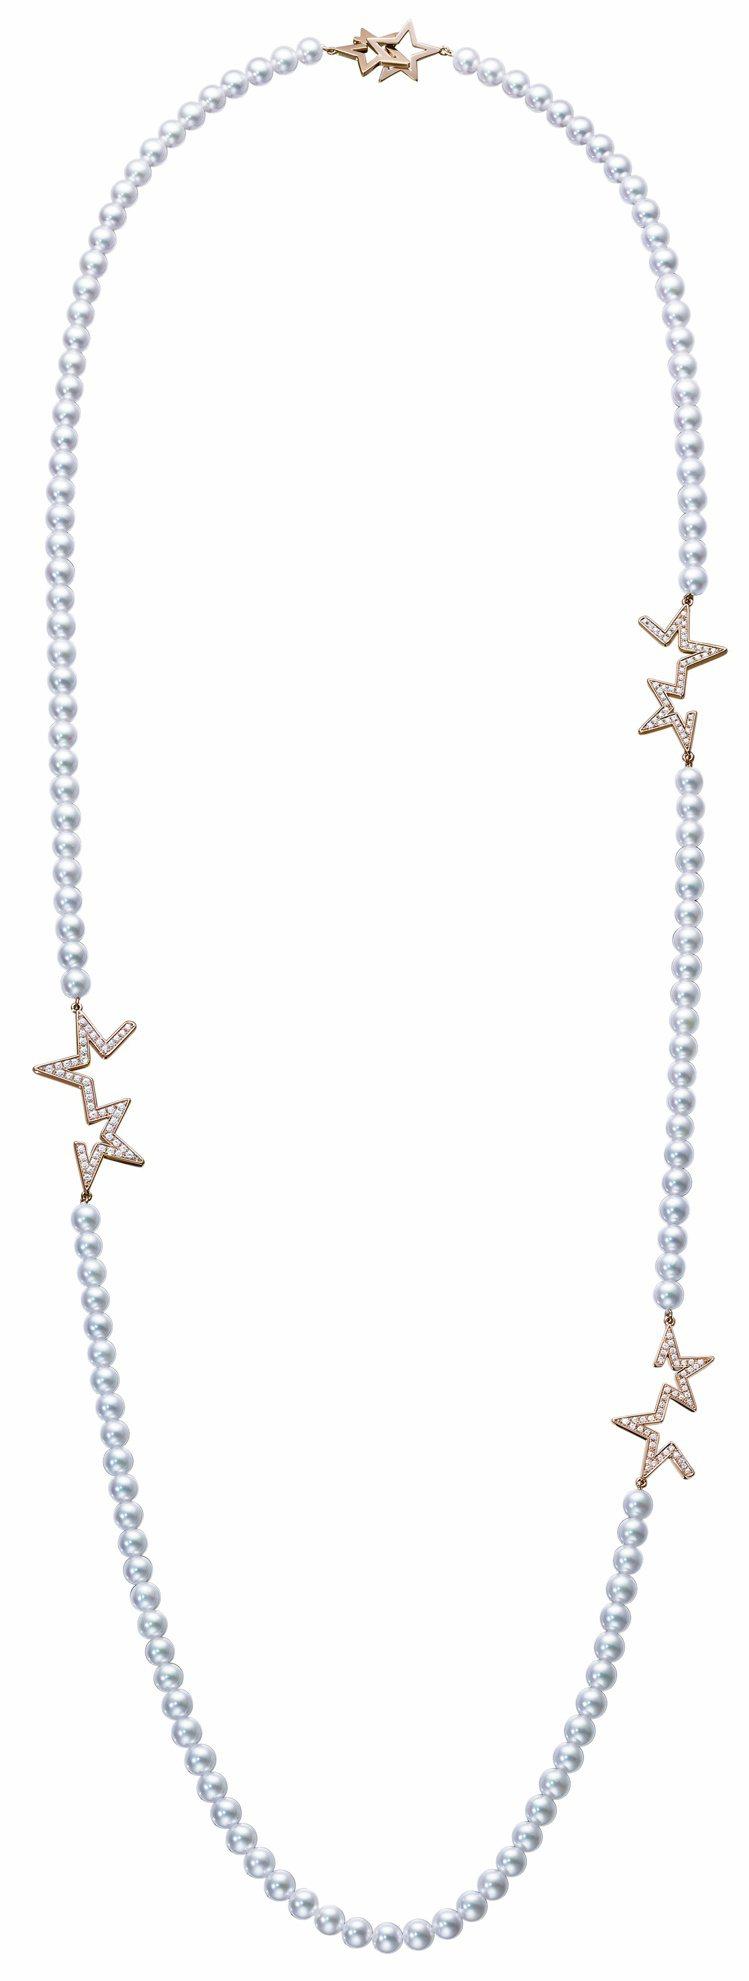 TASAKI abstract star鑽石珍珠櫻花金項鍊,74萬6,000元。